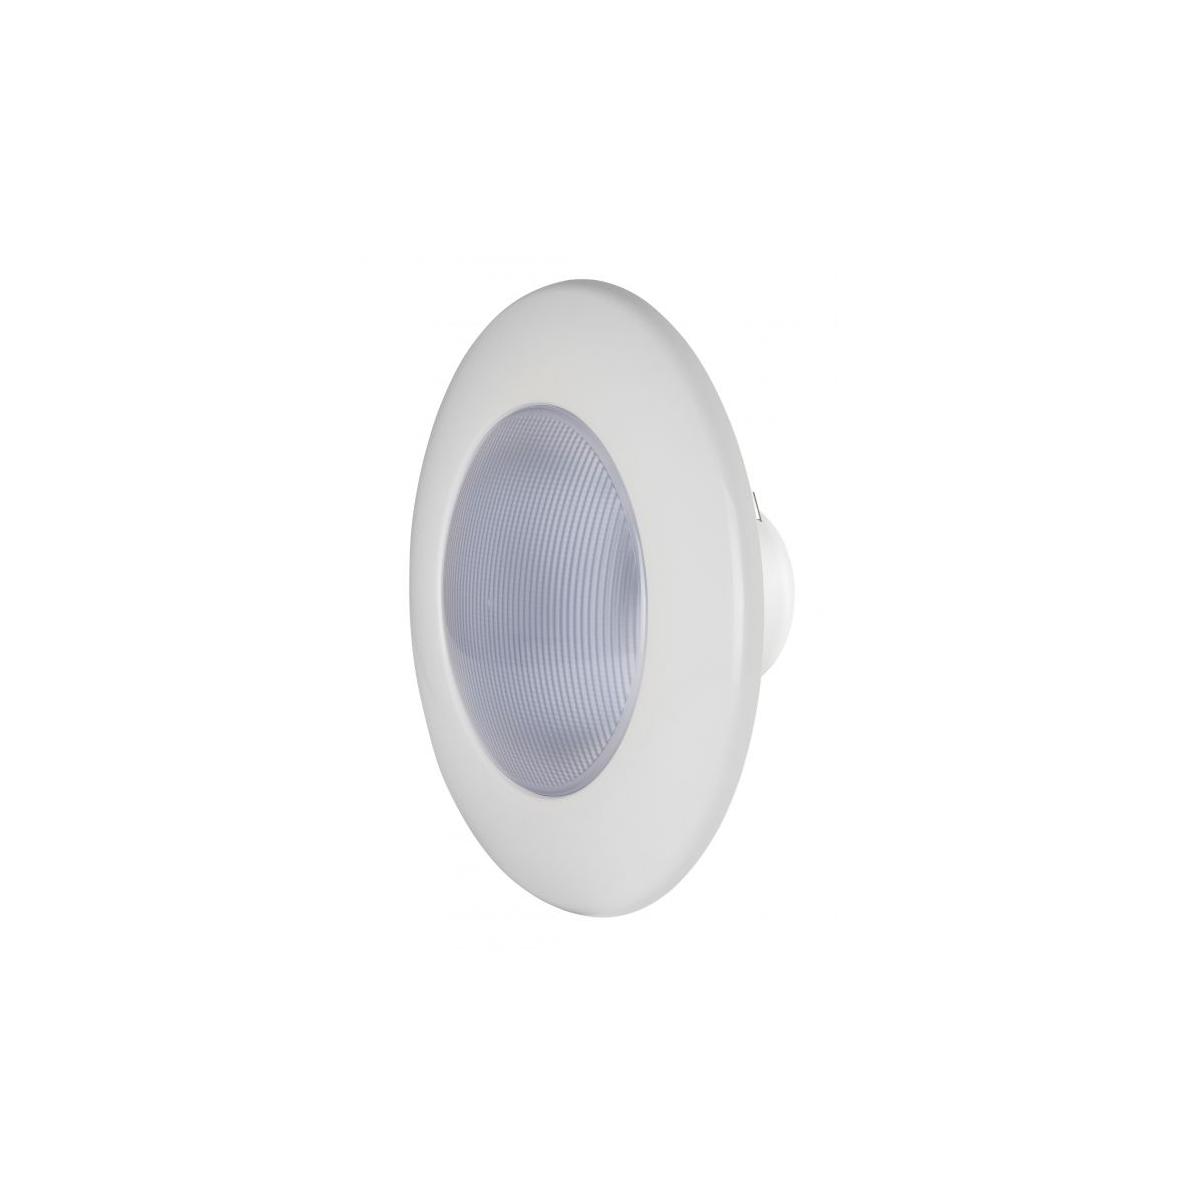 LED light PAR56 for niche Astralpool